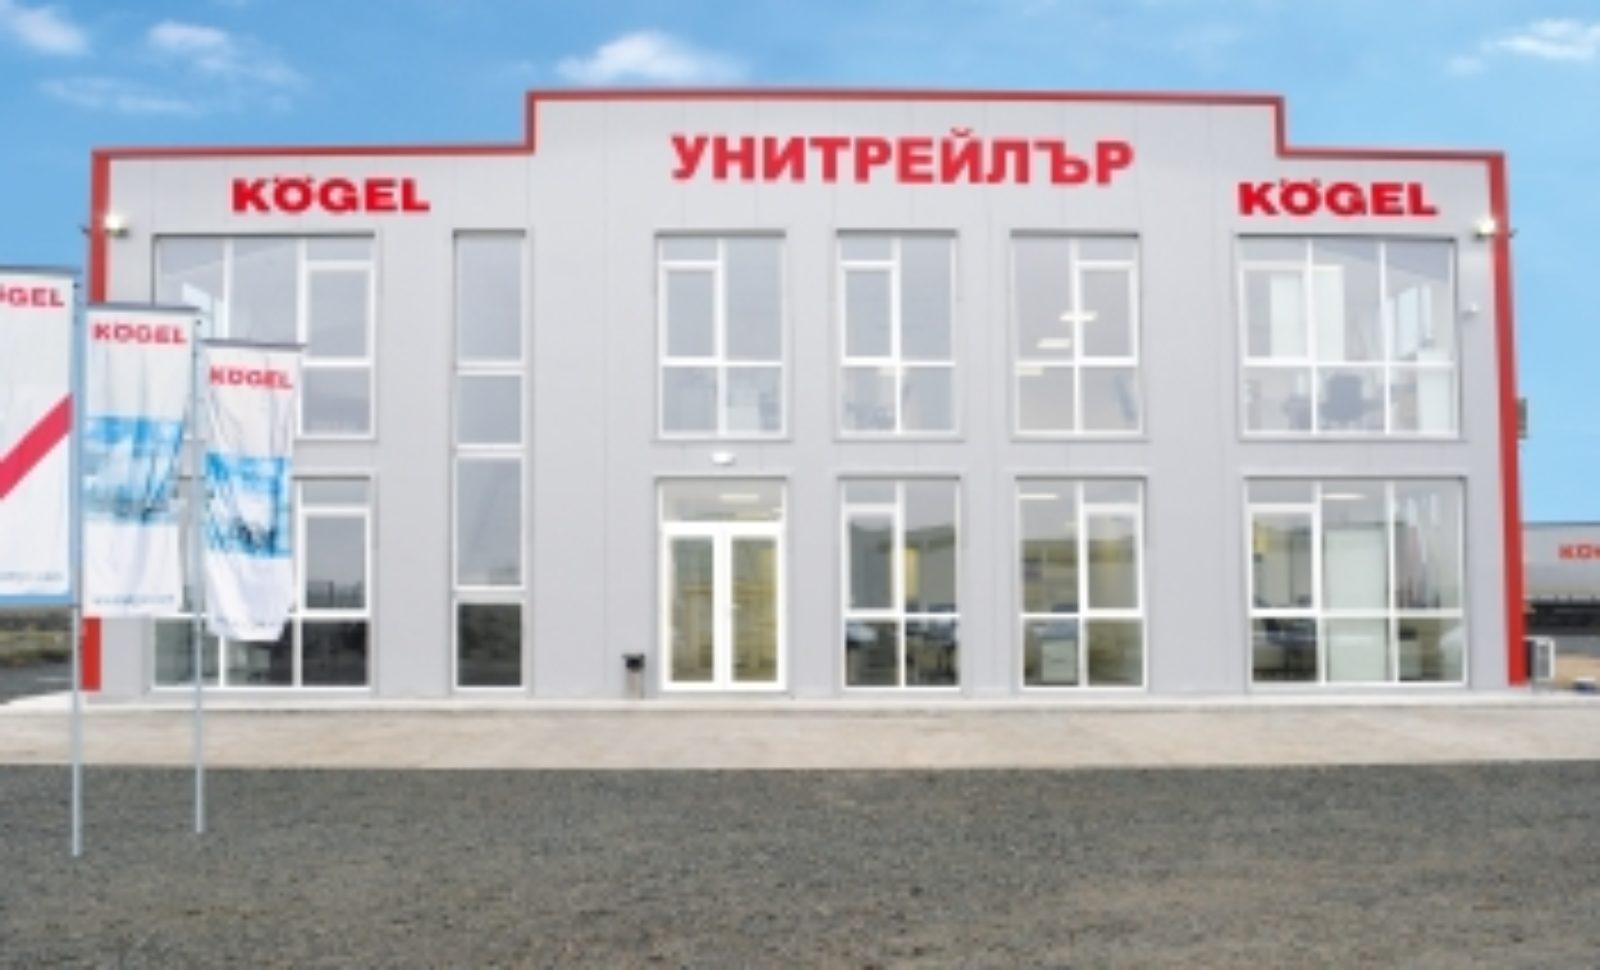 Unitrailer übernimmt gesamte Kögel-Generalvertretung in Bulgarien